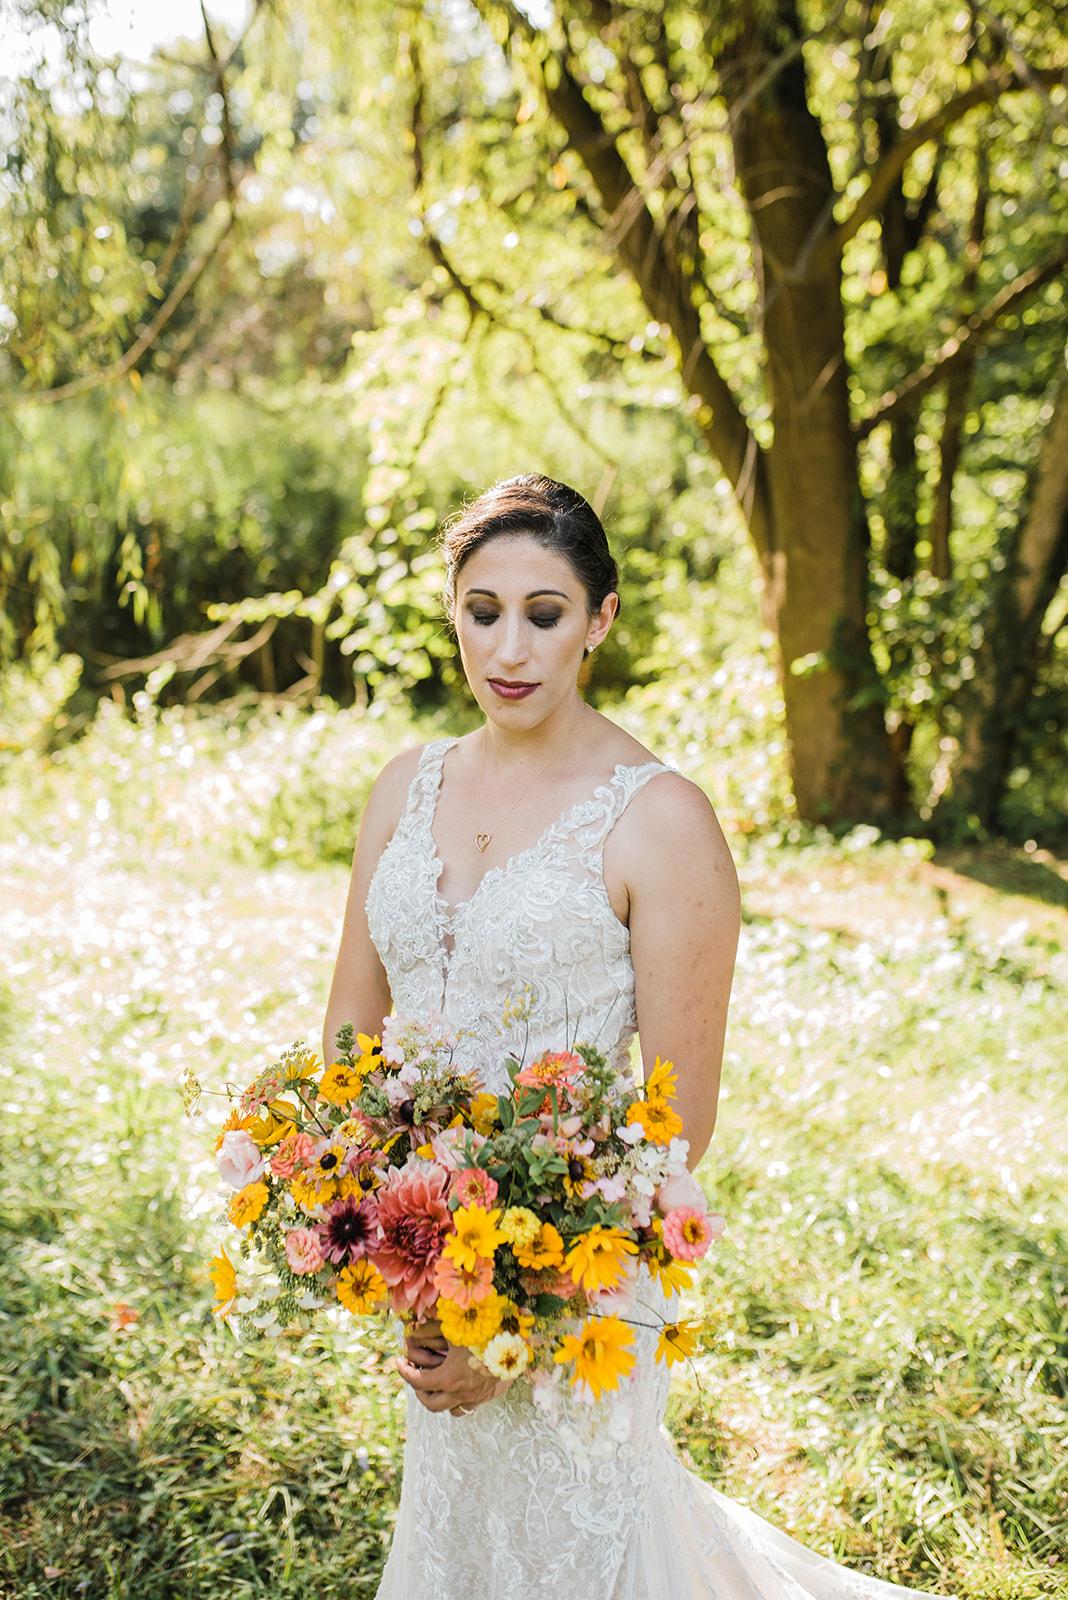 Heather McBride Photography